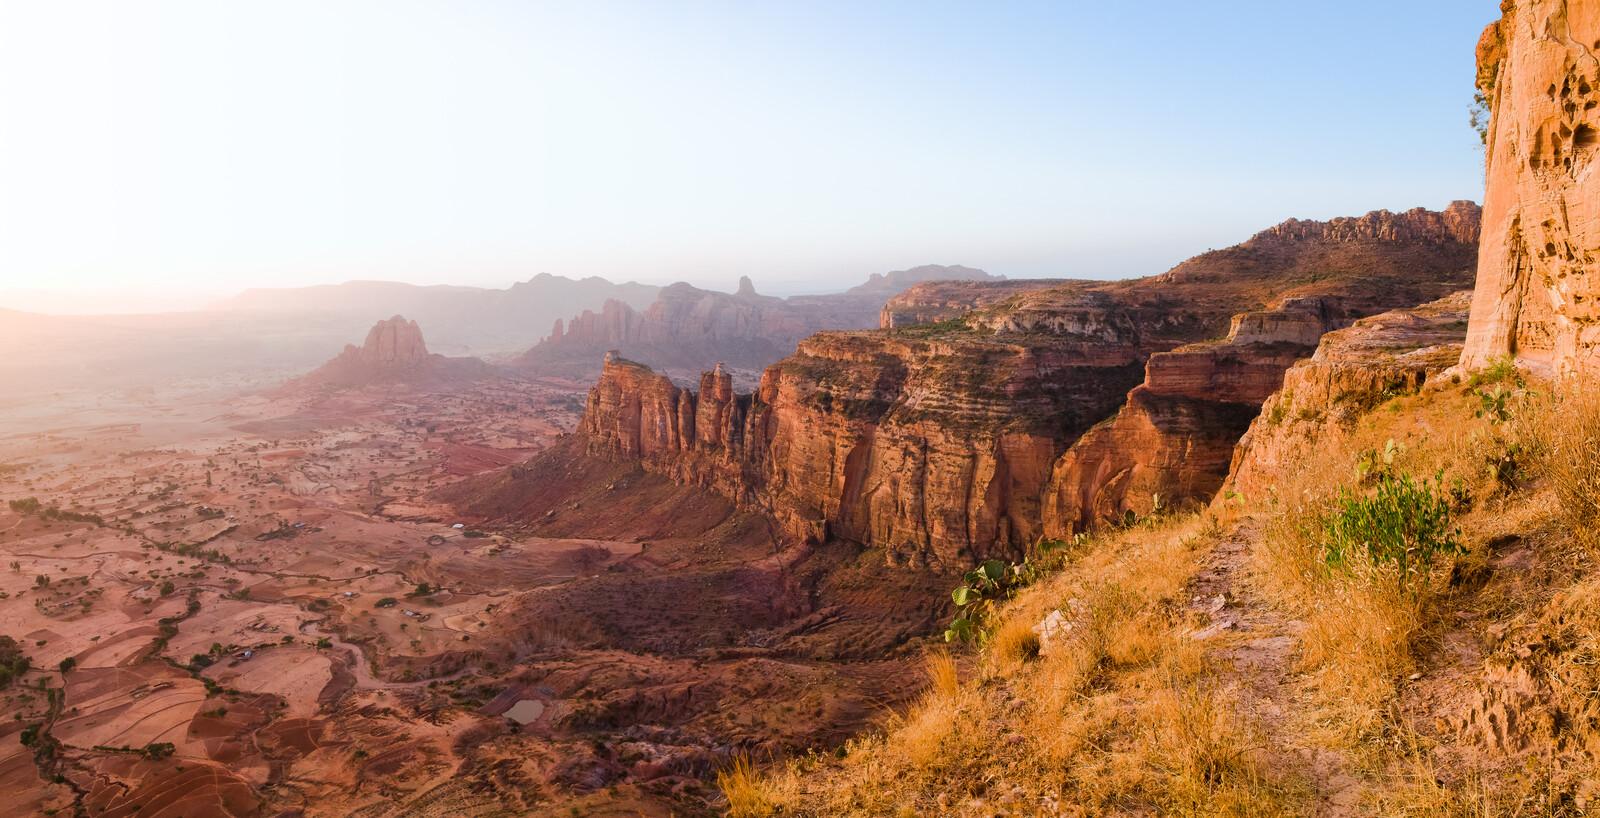 Blick von Daniel Korkor, Tigray, Äthiopien - Farin Urlaub